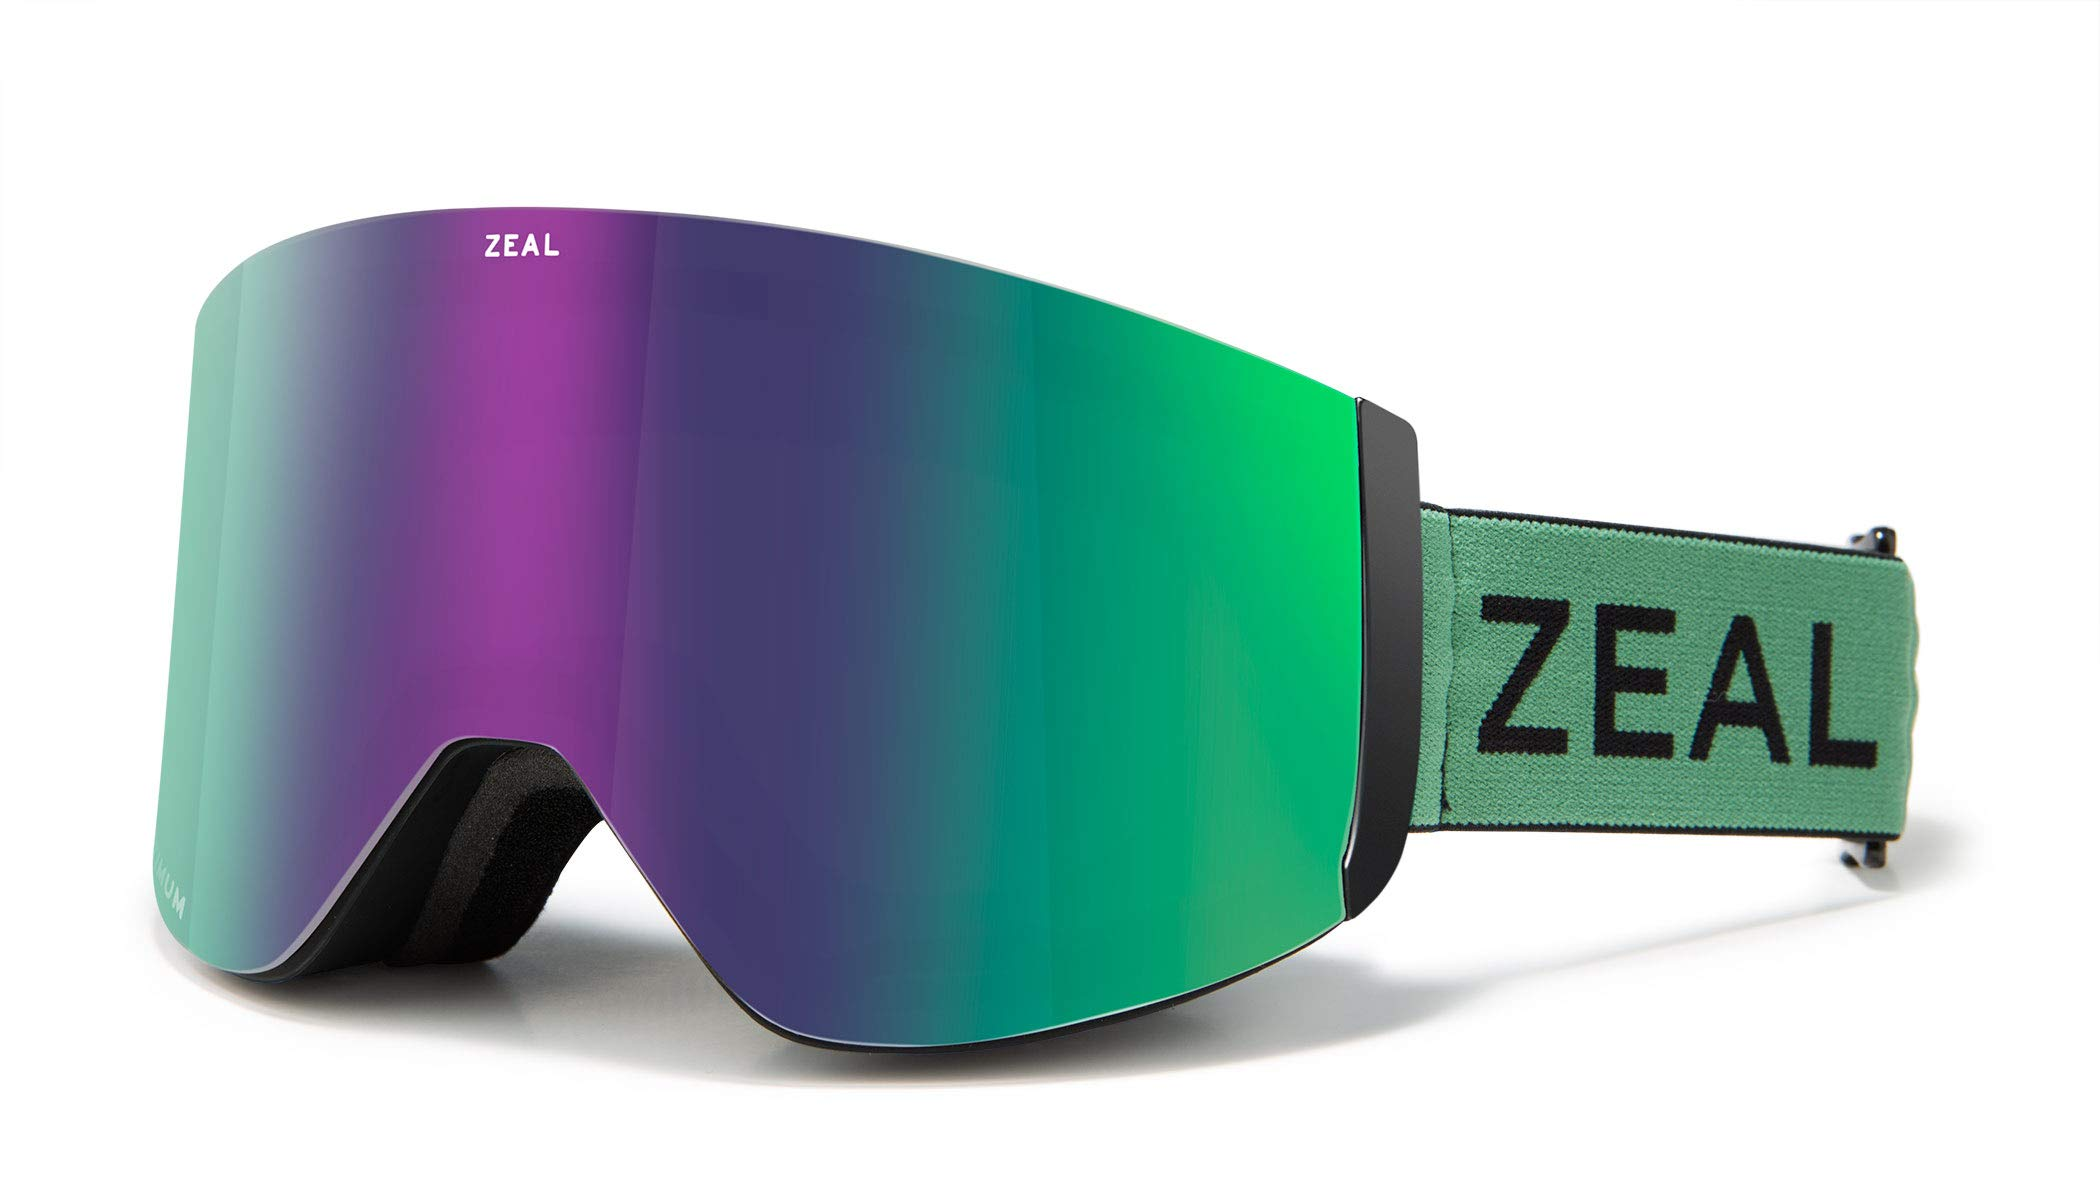 Zeal Optics Hatchet - Frameless Ski & Snowboard Goggles for Men & Women, Rail Lock System Goggles